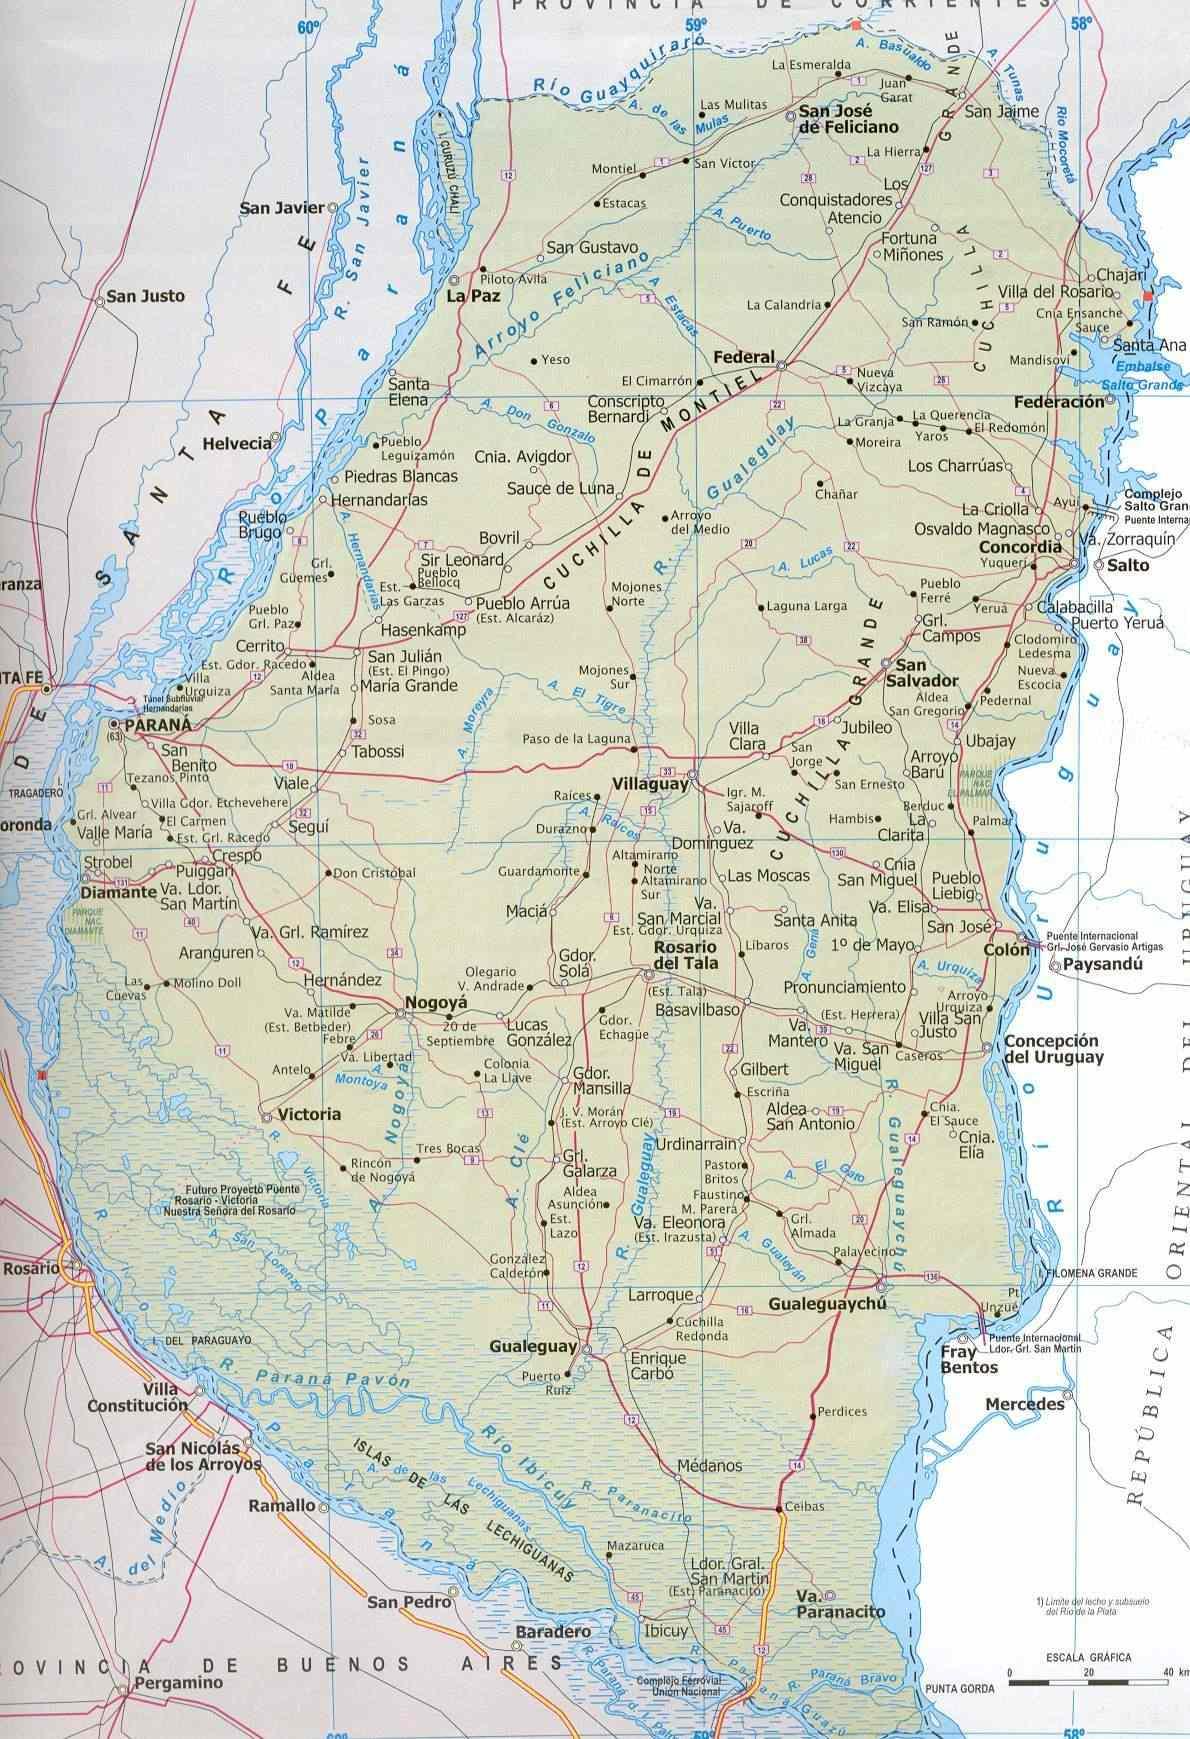 Mapa Provincia de Entre Rios, Argentina